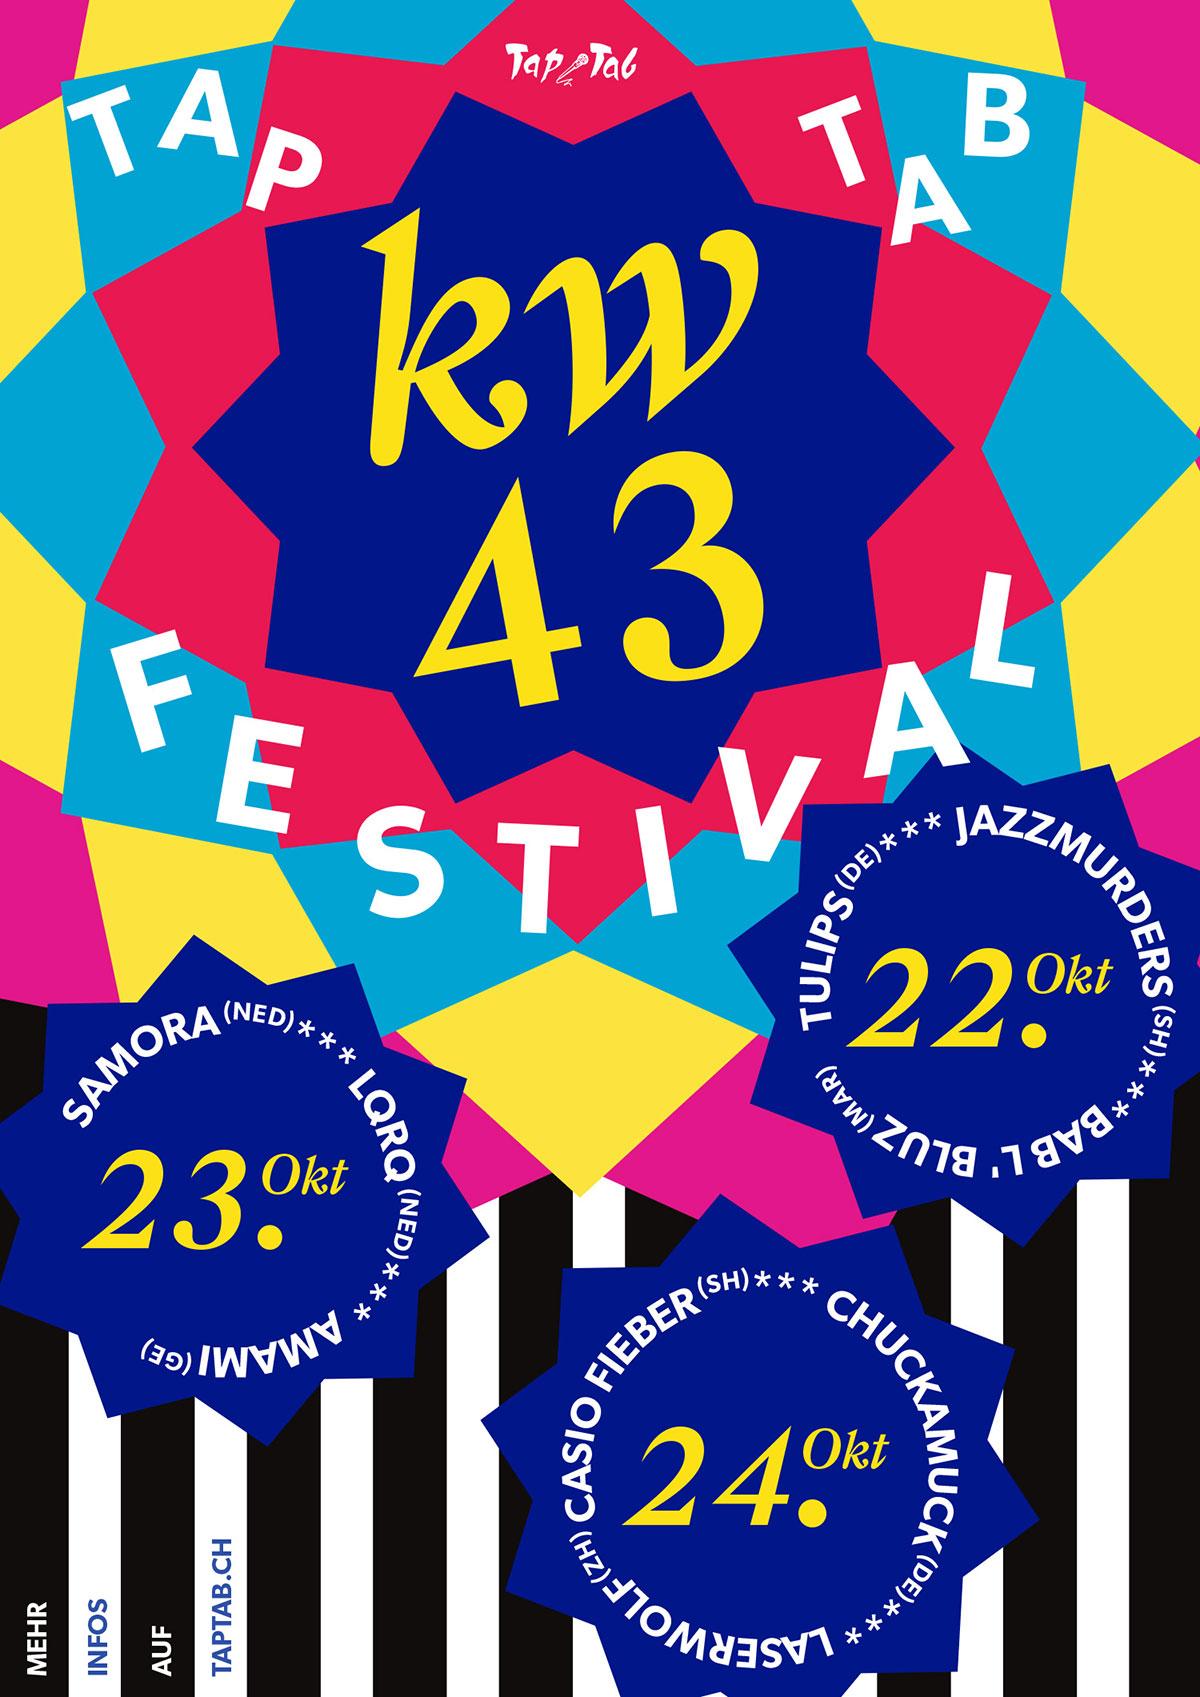 KW43-Festival